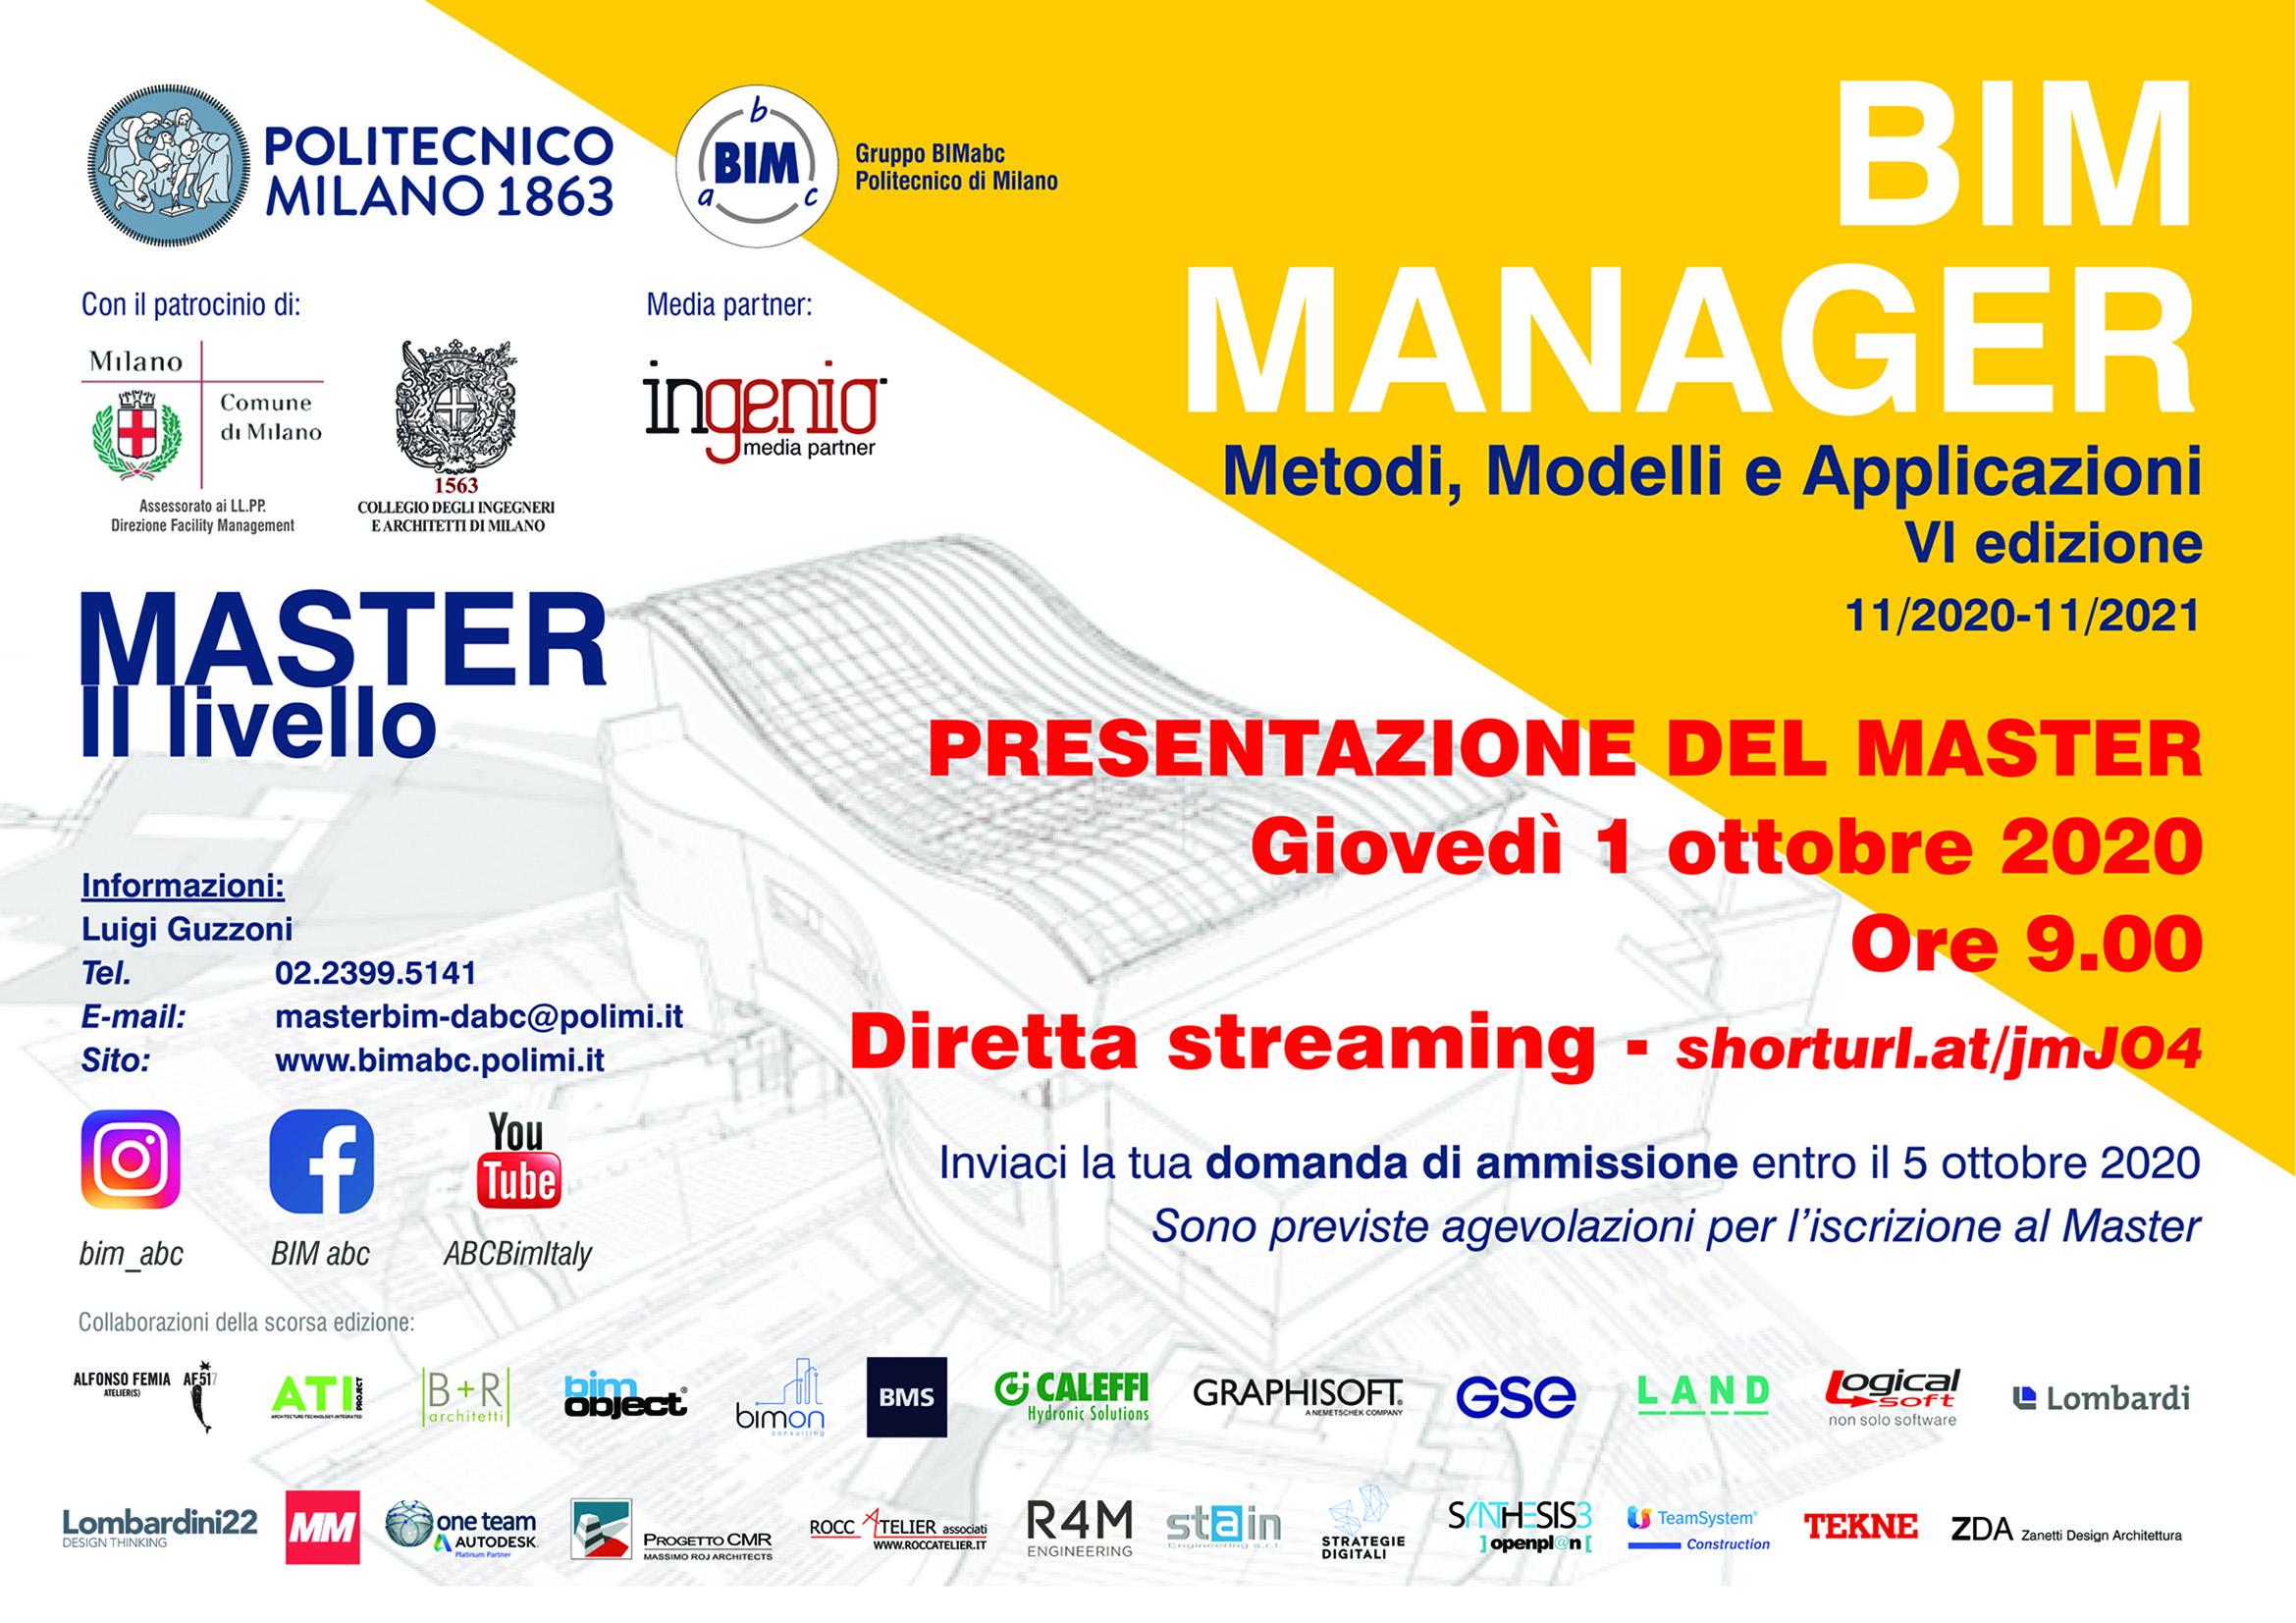 Presentazione Master BIM IV edizione 2020-2021